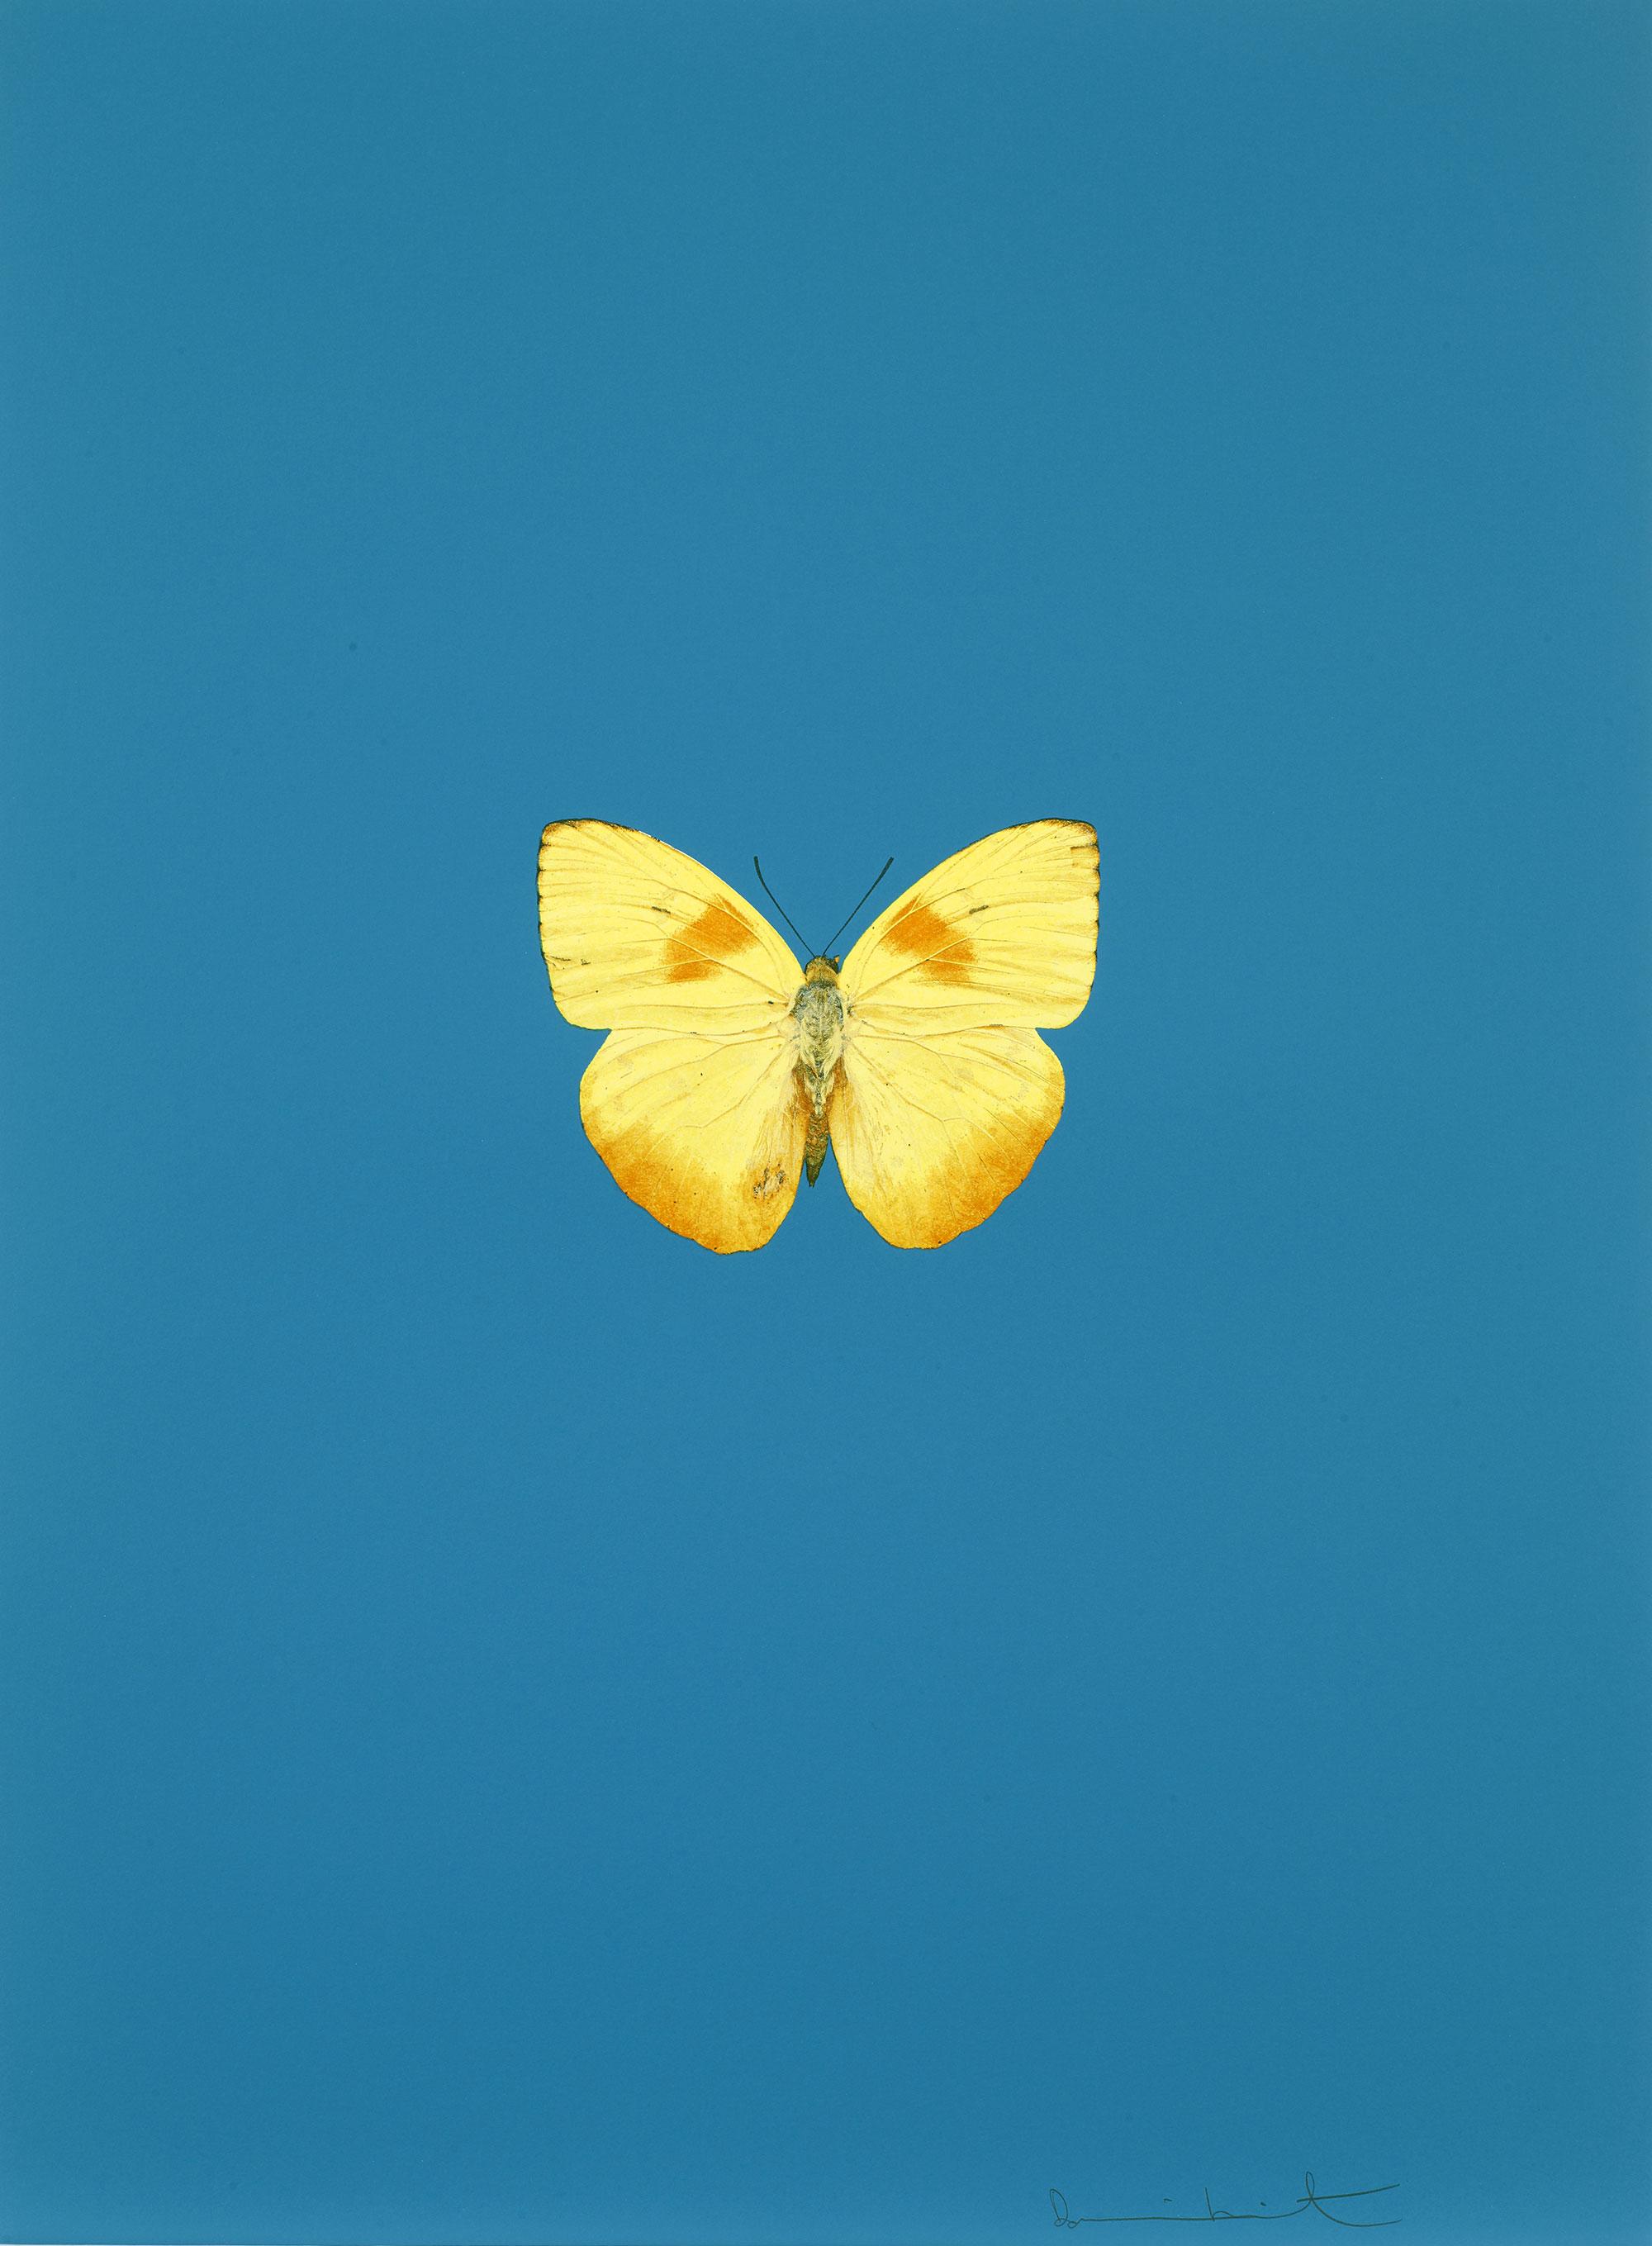 Damien Hirst    It's a Beautiful Day (azul) •2013 Gravura polimerizada Edição: 55 66.5 x 49 cm